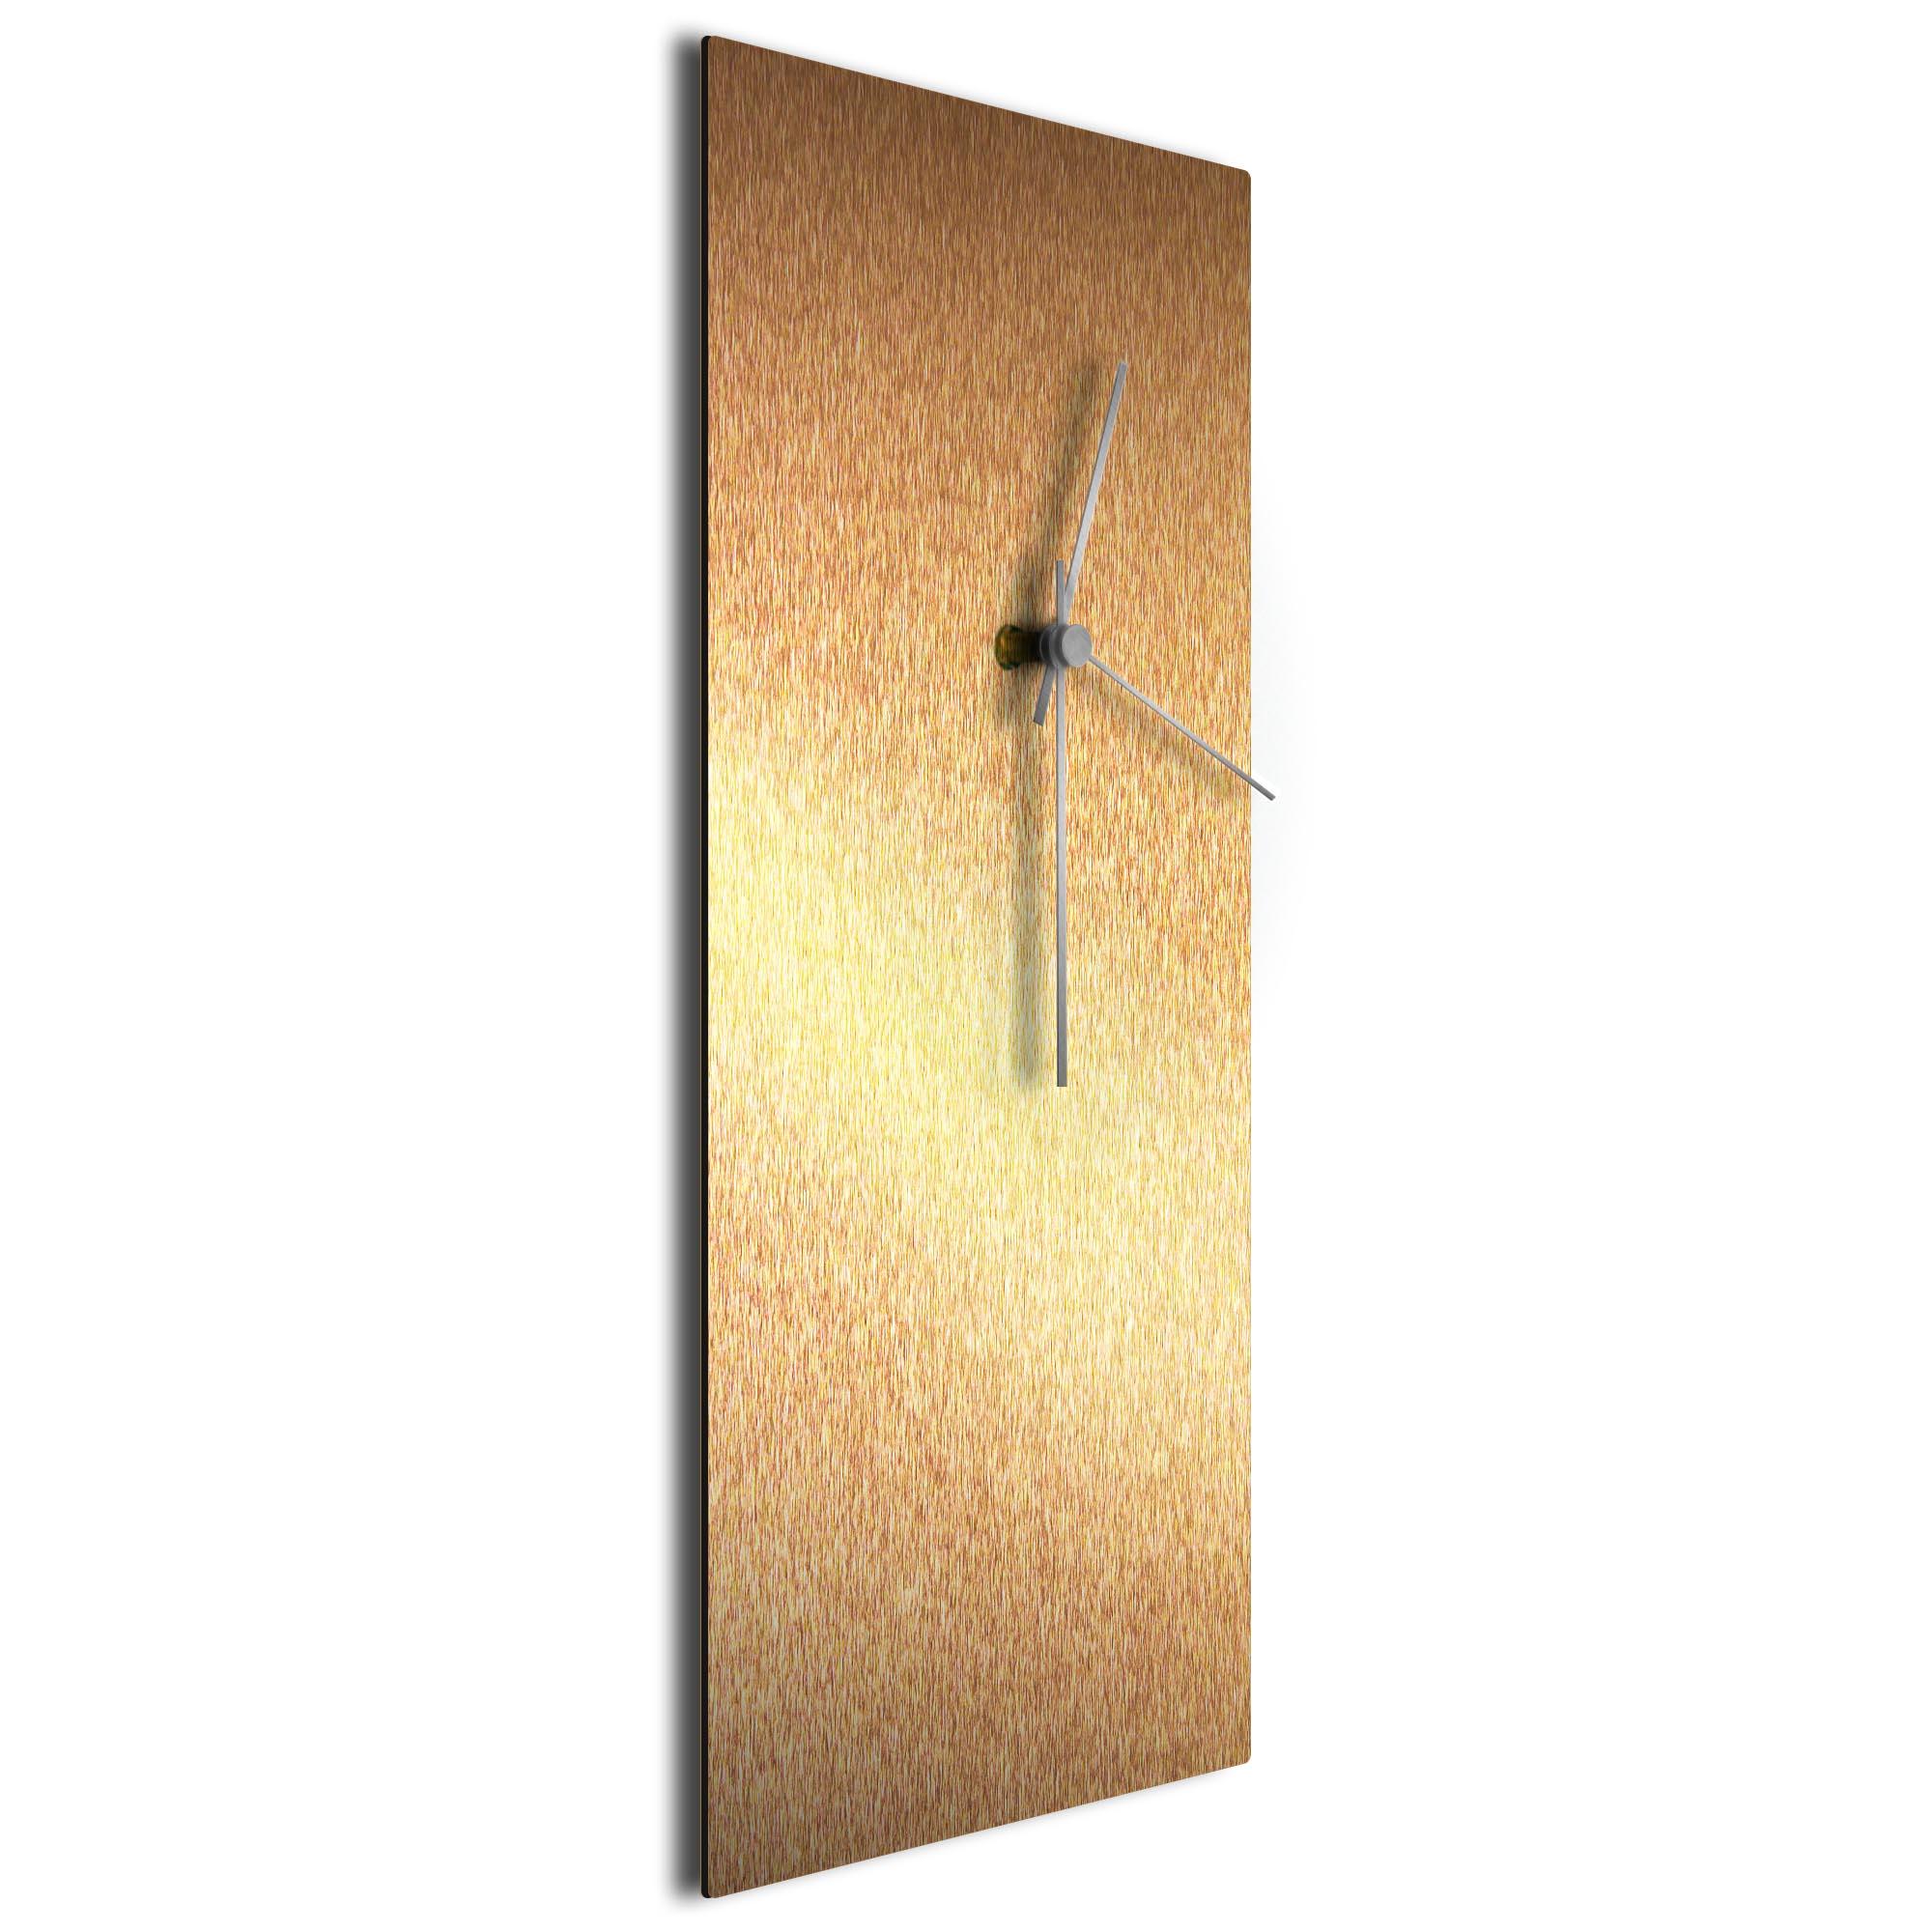 Bronzesmith Clock Large Silver - Image 2